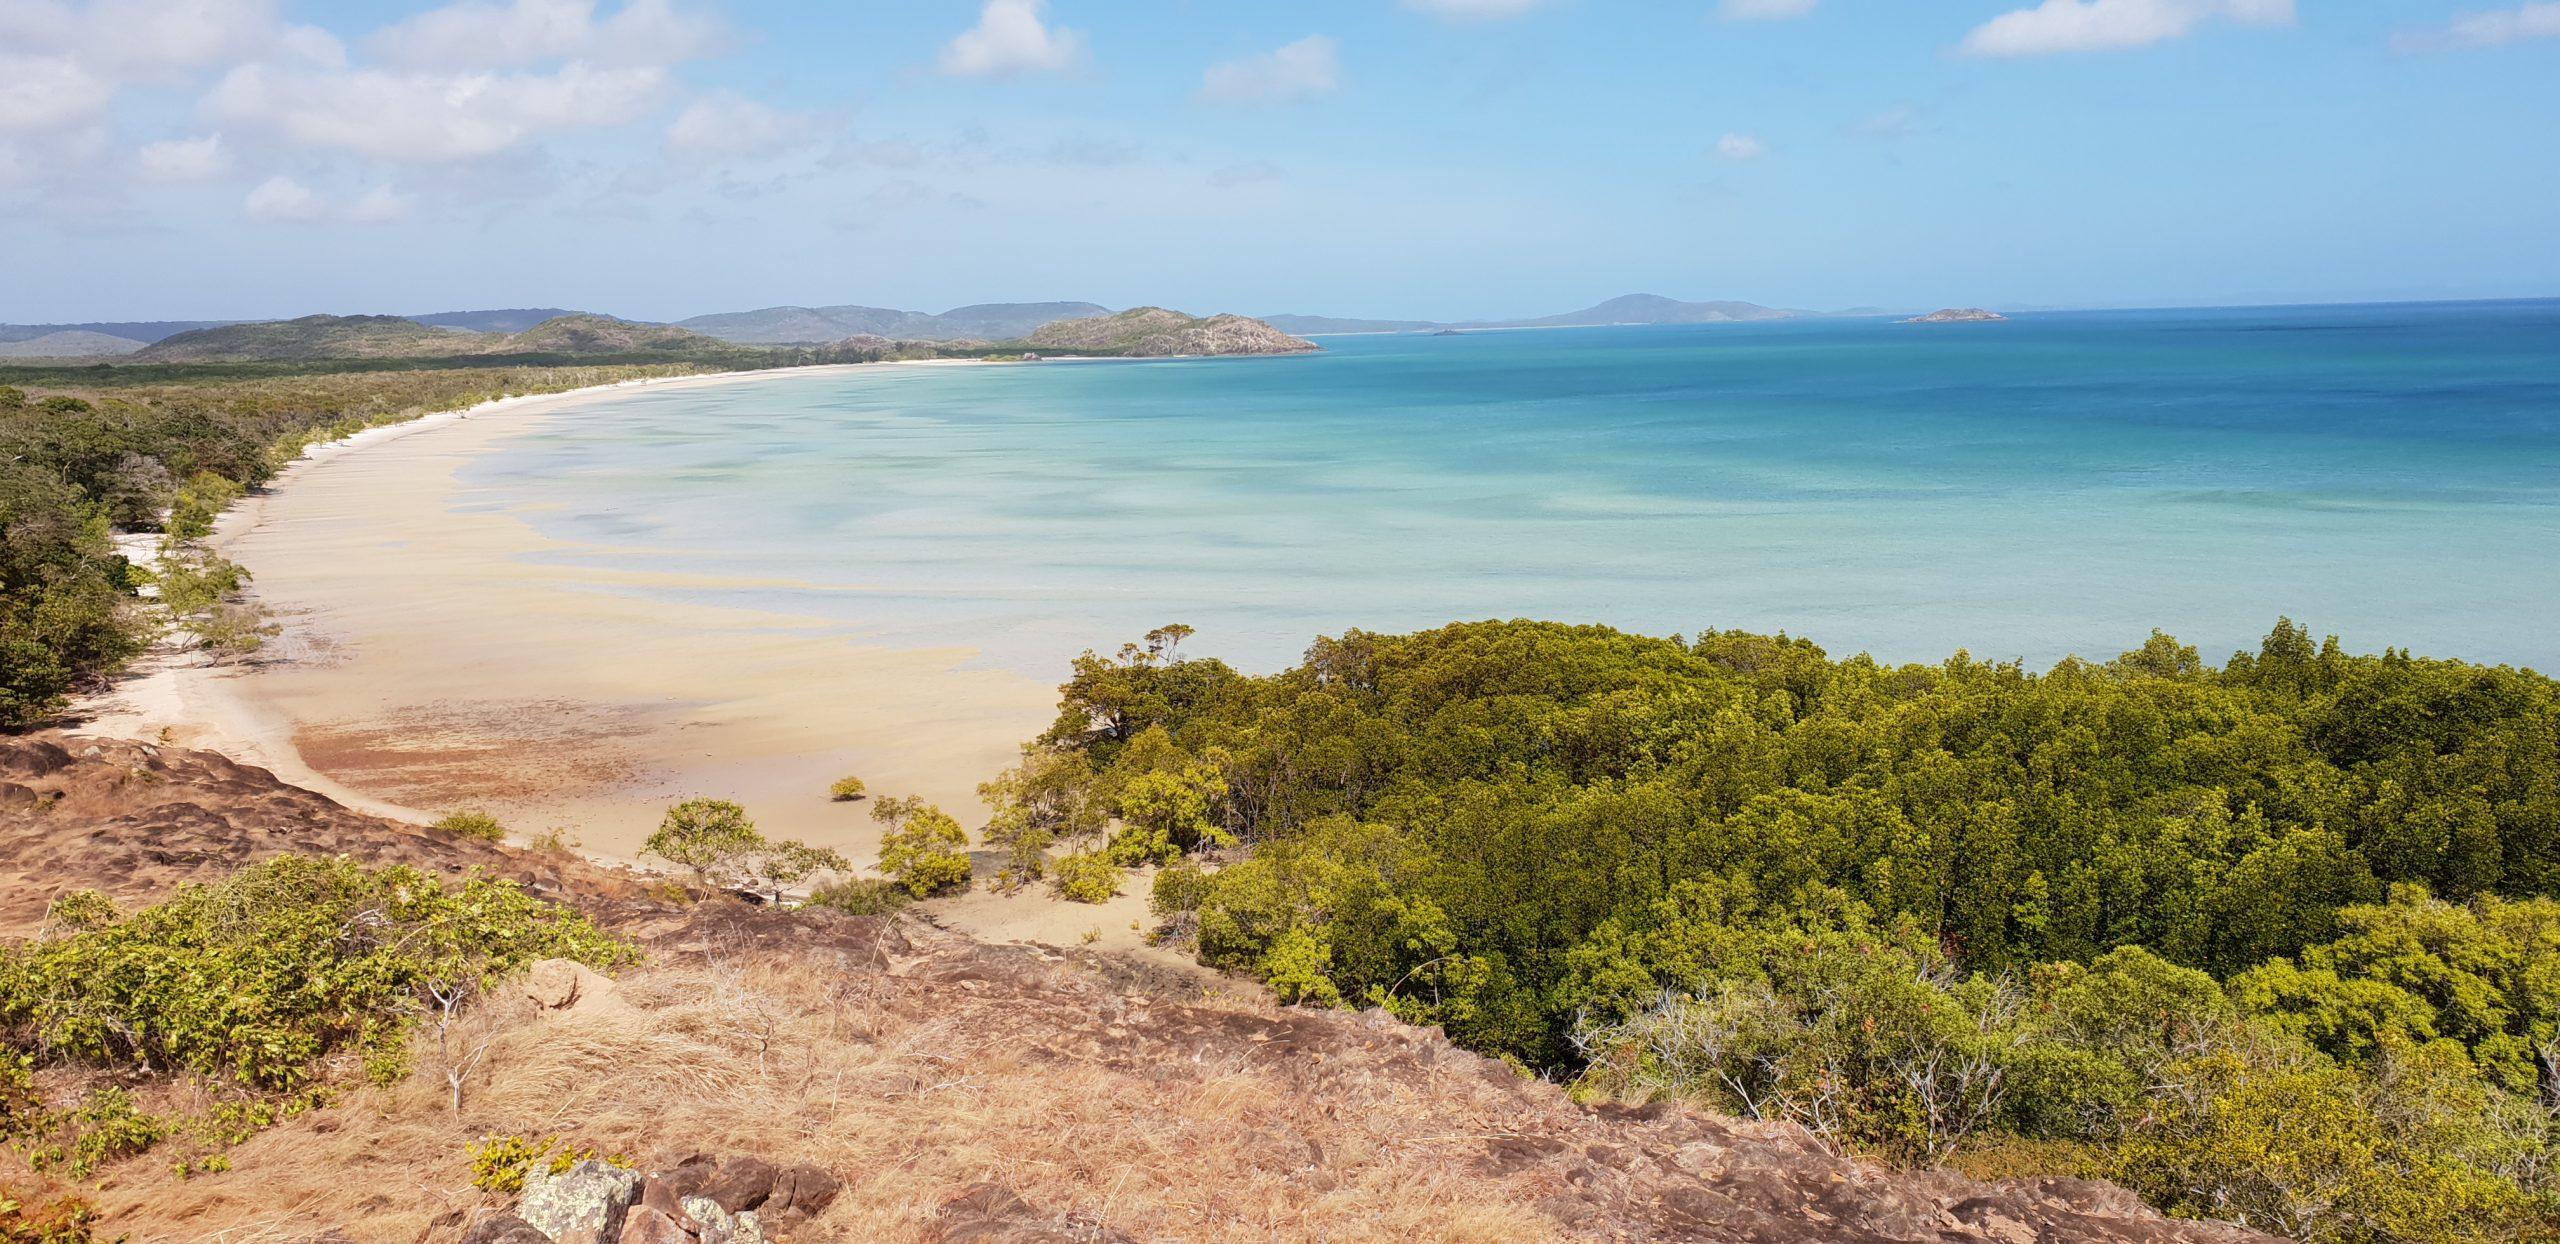 Cape York Tip - view of Frangipani Beach